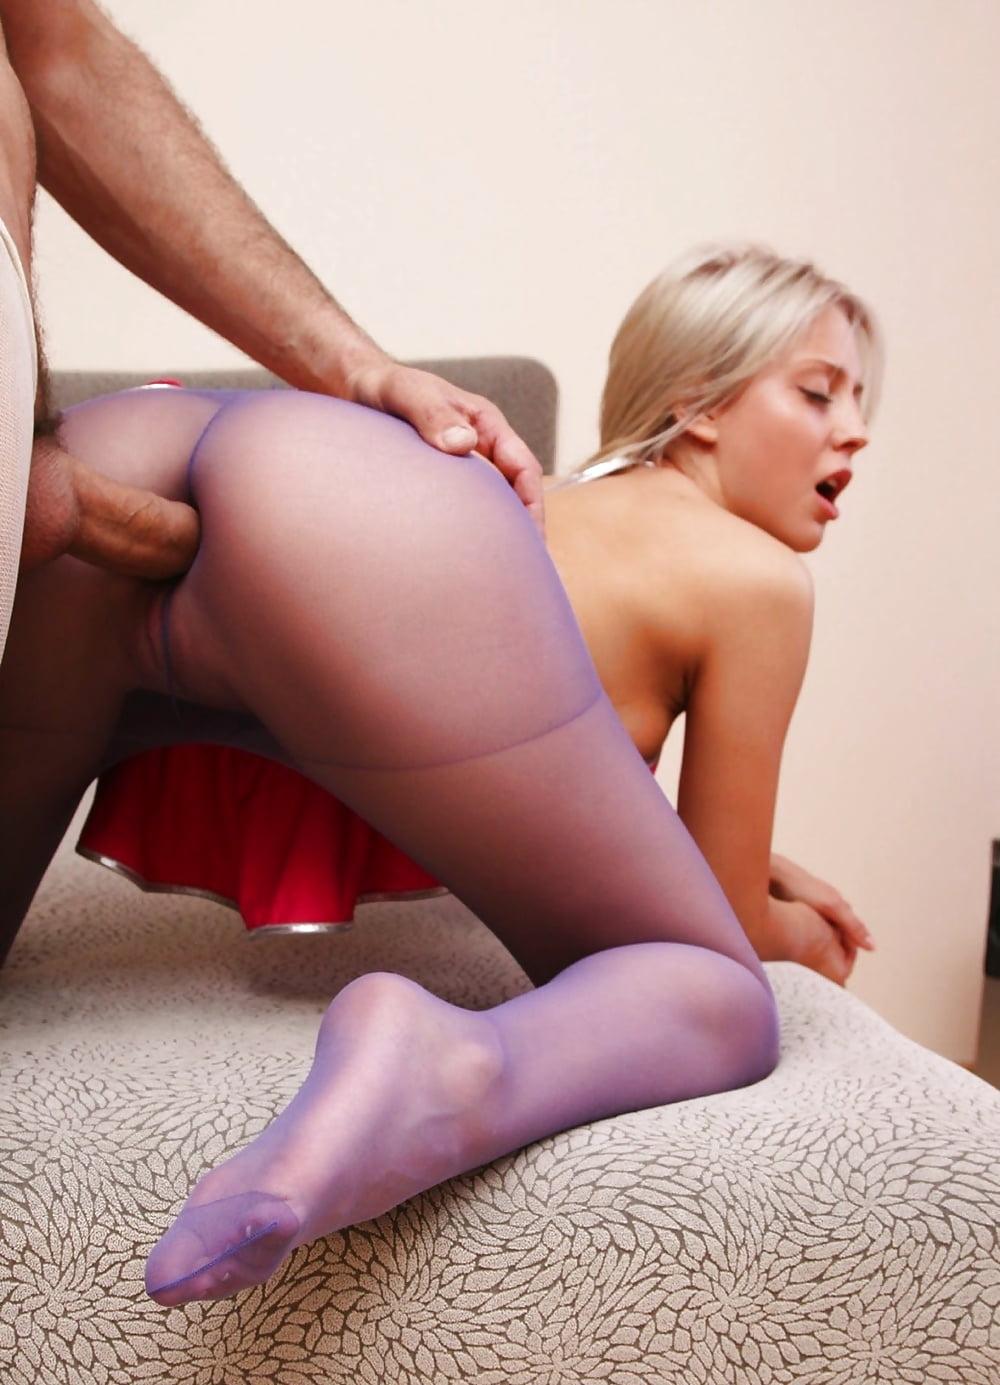 Порно фото секс девушек через колготки — pic 1